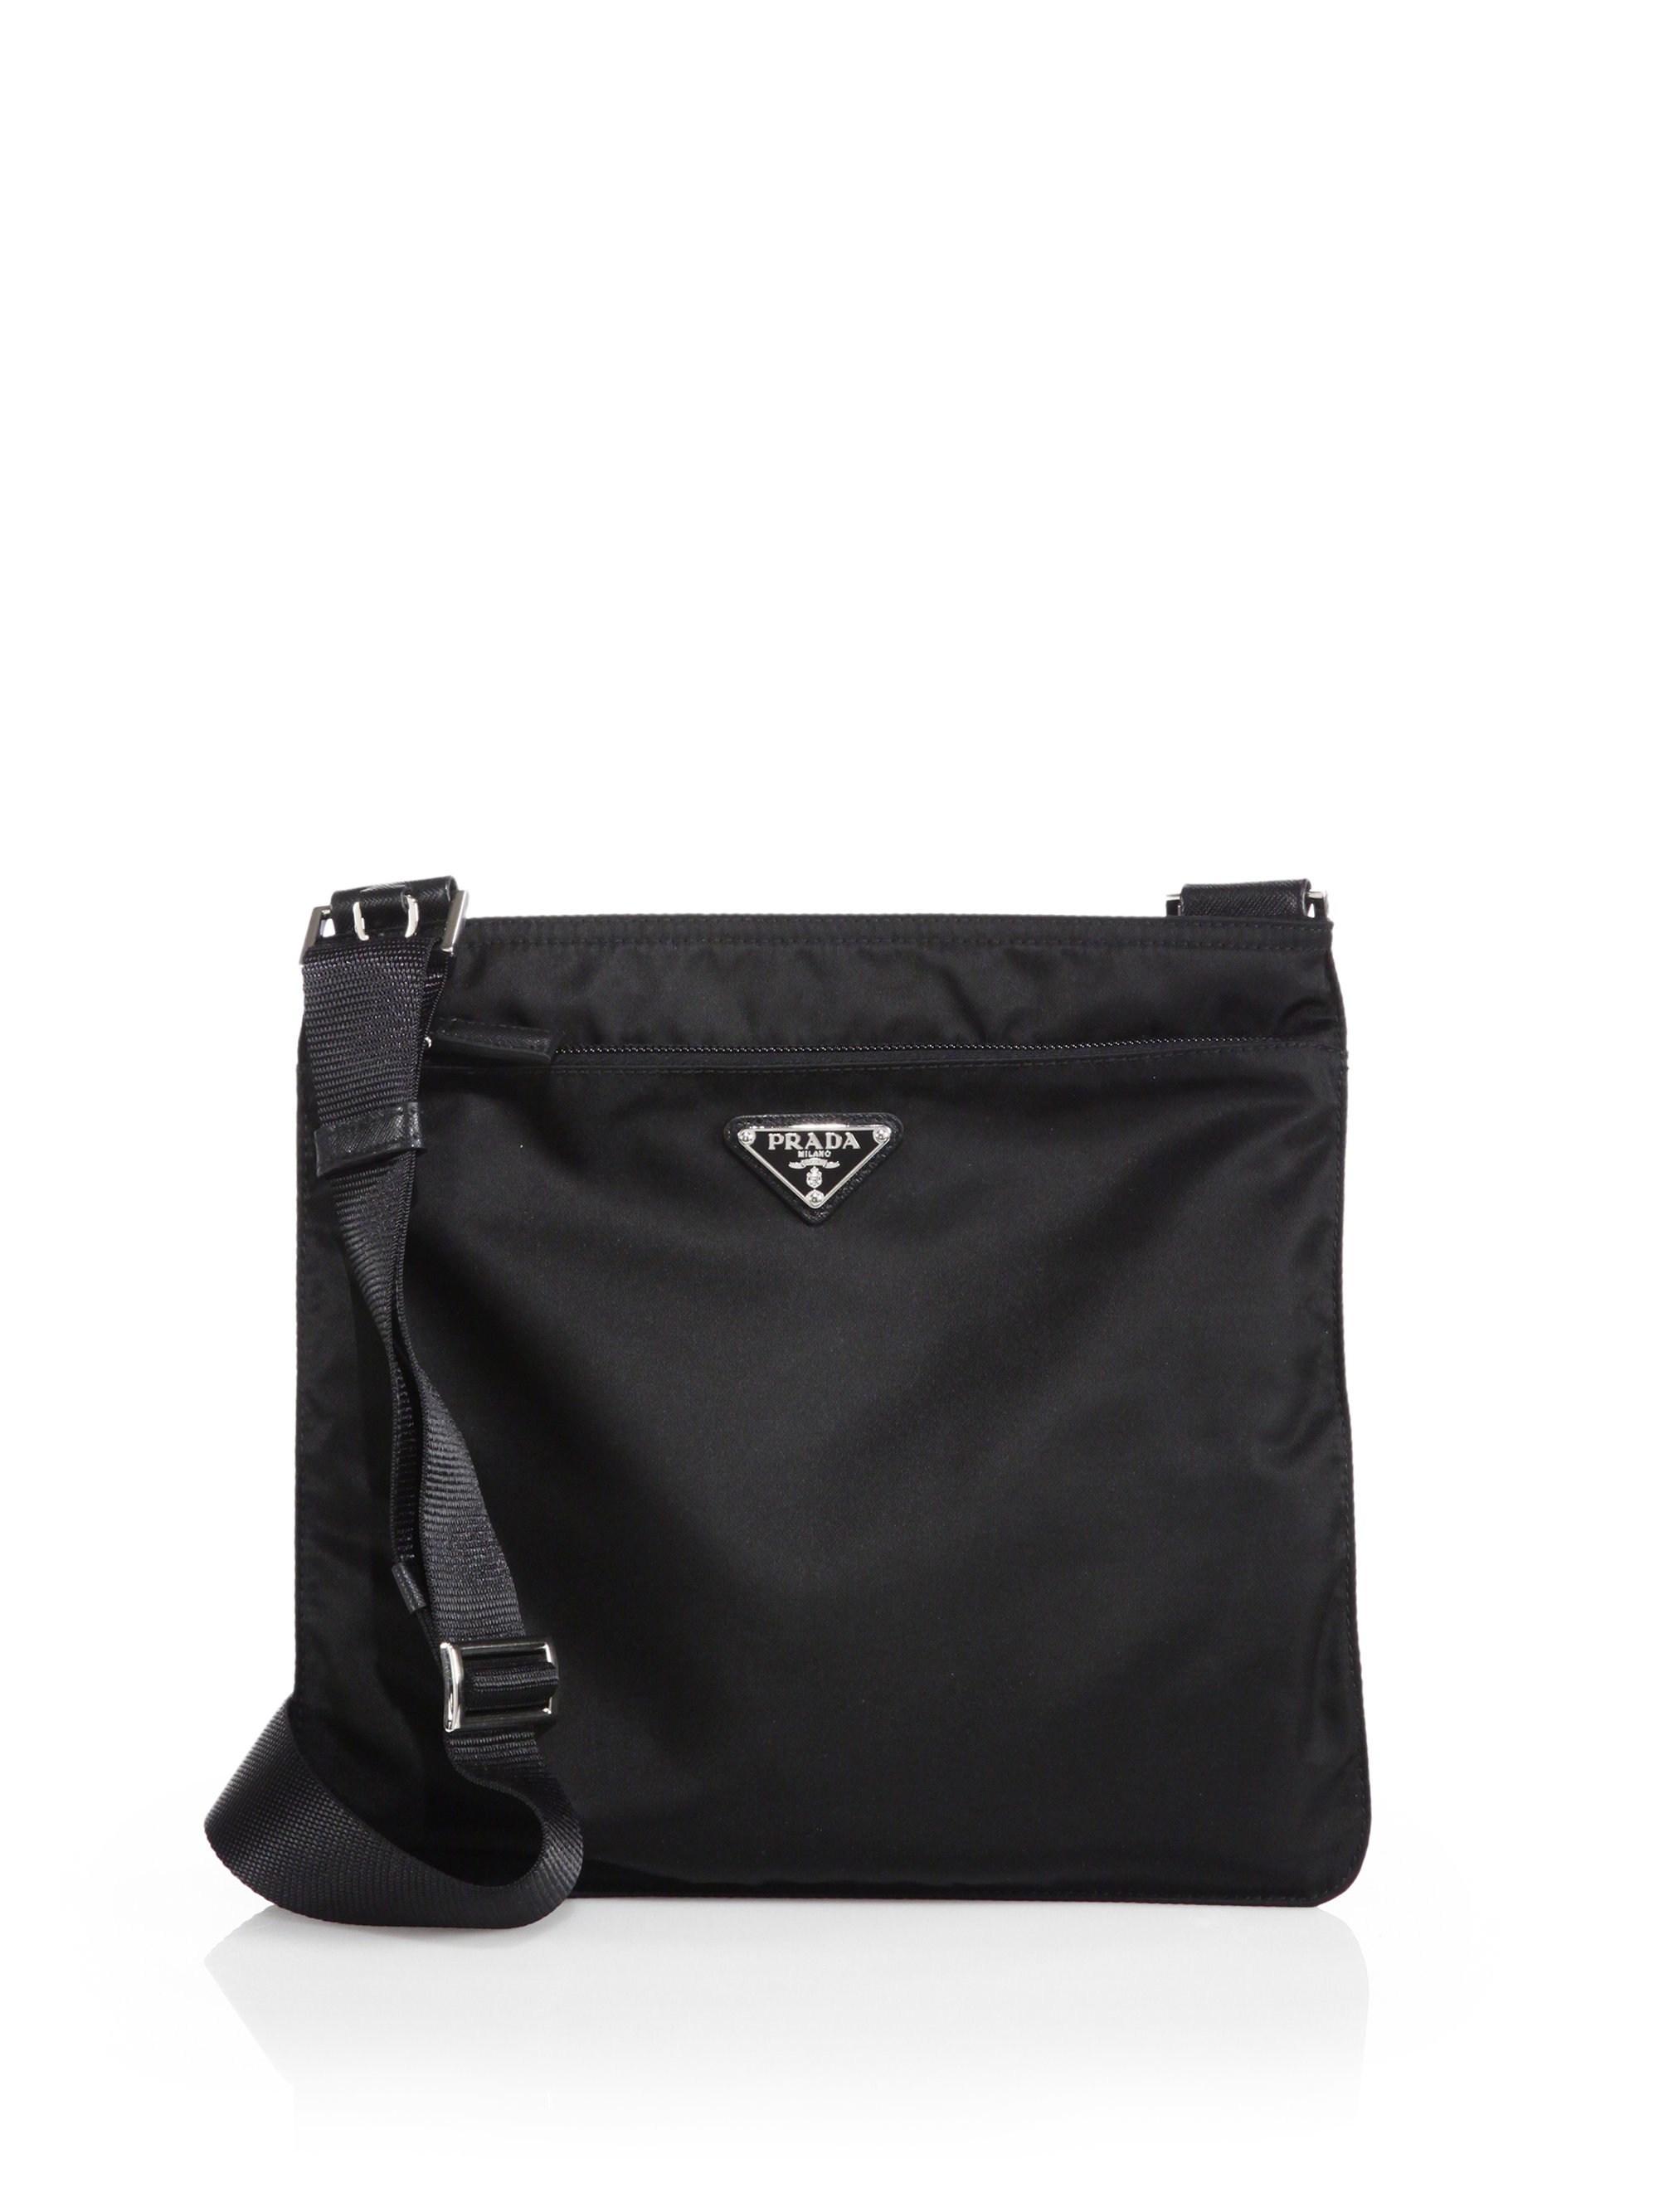 a210c38c308f Prada - Women's Small Nylon Crossbody Bag - Black - Lyst. View fullscreen